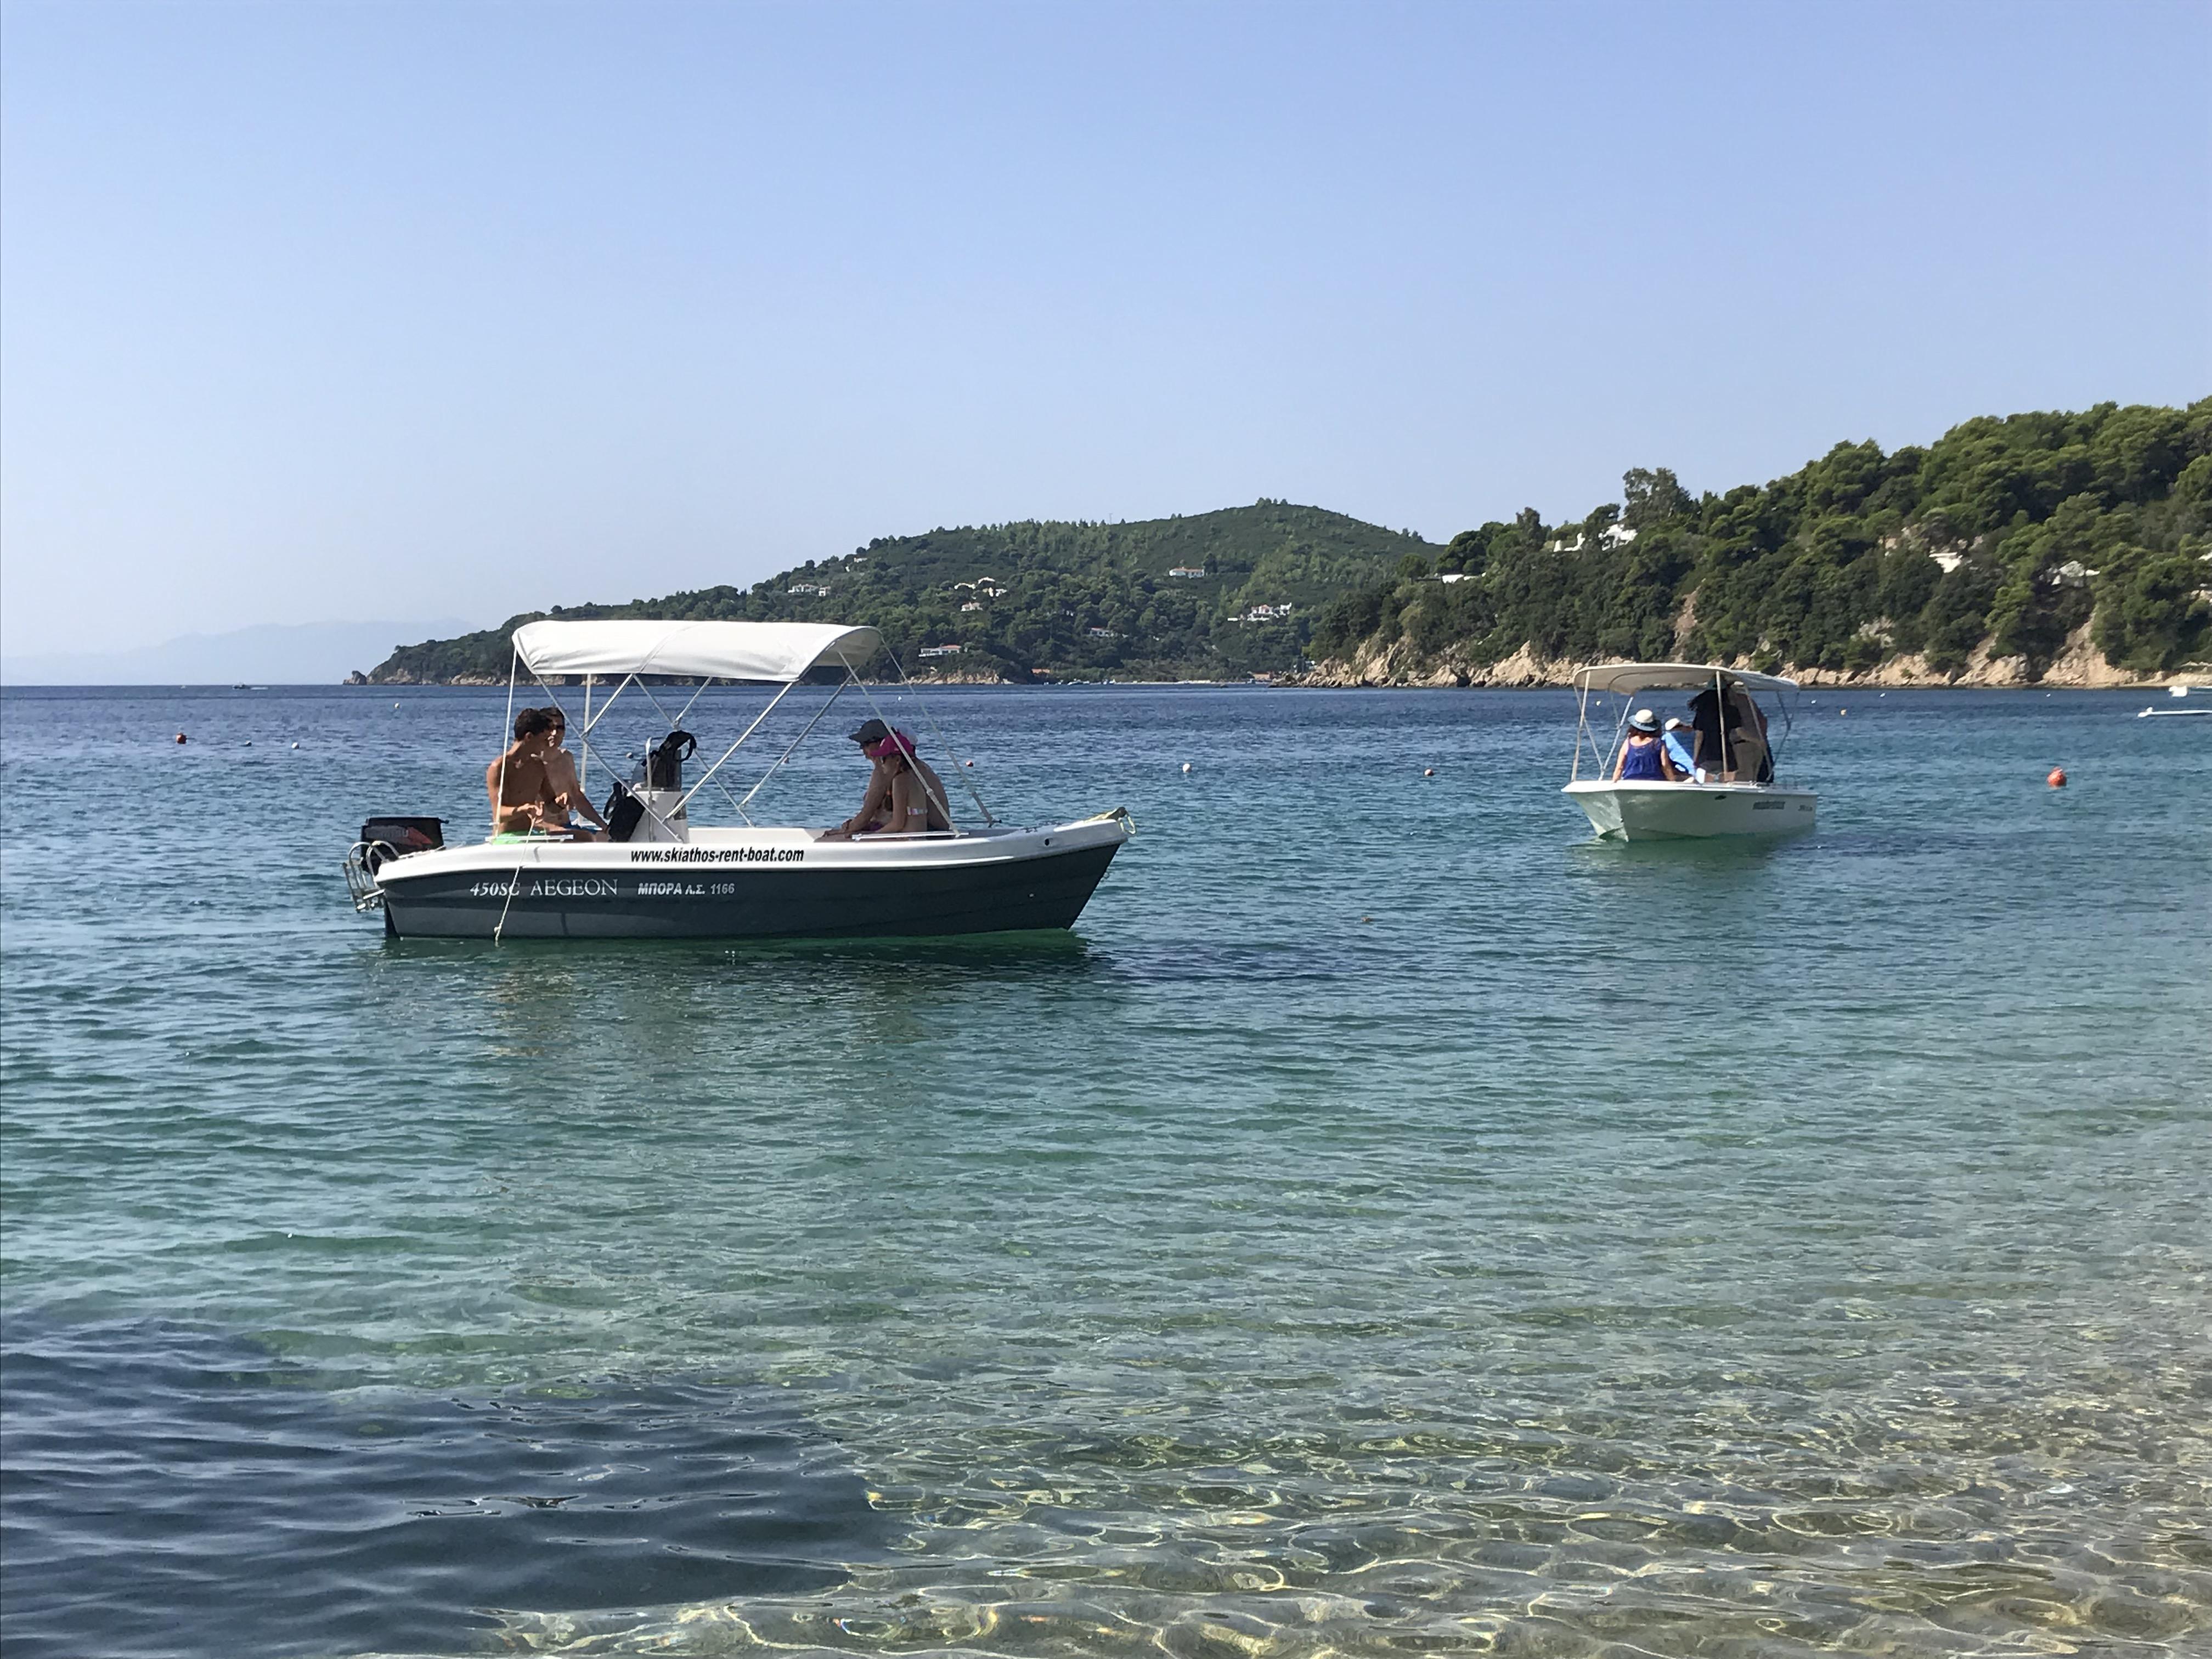 skiathos rent boats,skiathos rental boats,skiathos boats for hire,skiathos boats,skiathos boat hire,skiathos,grece